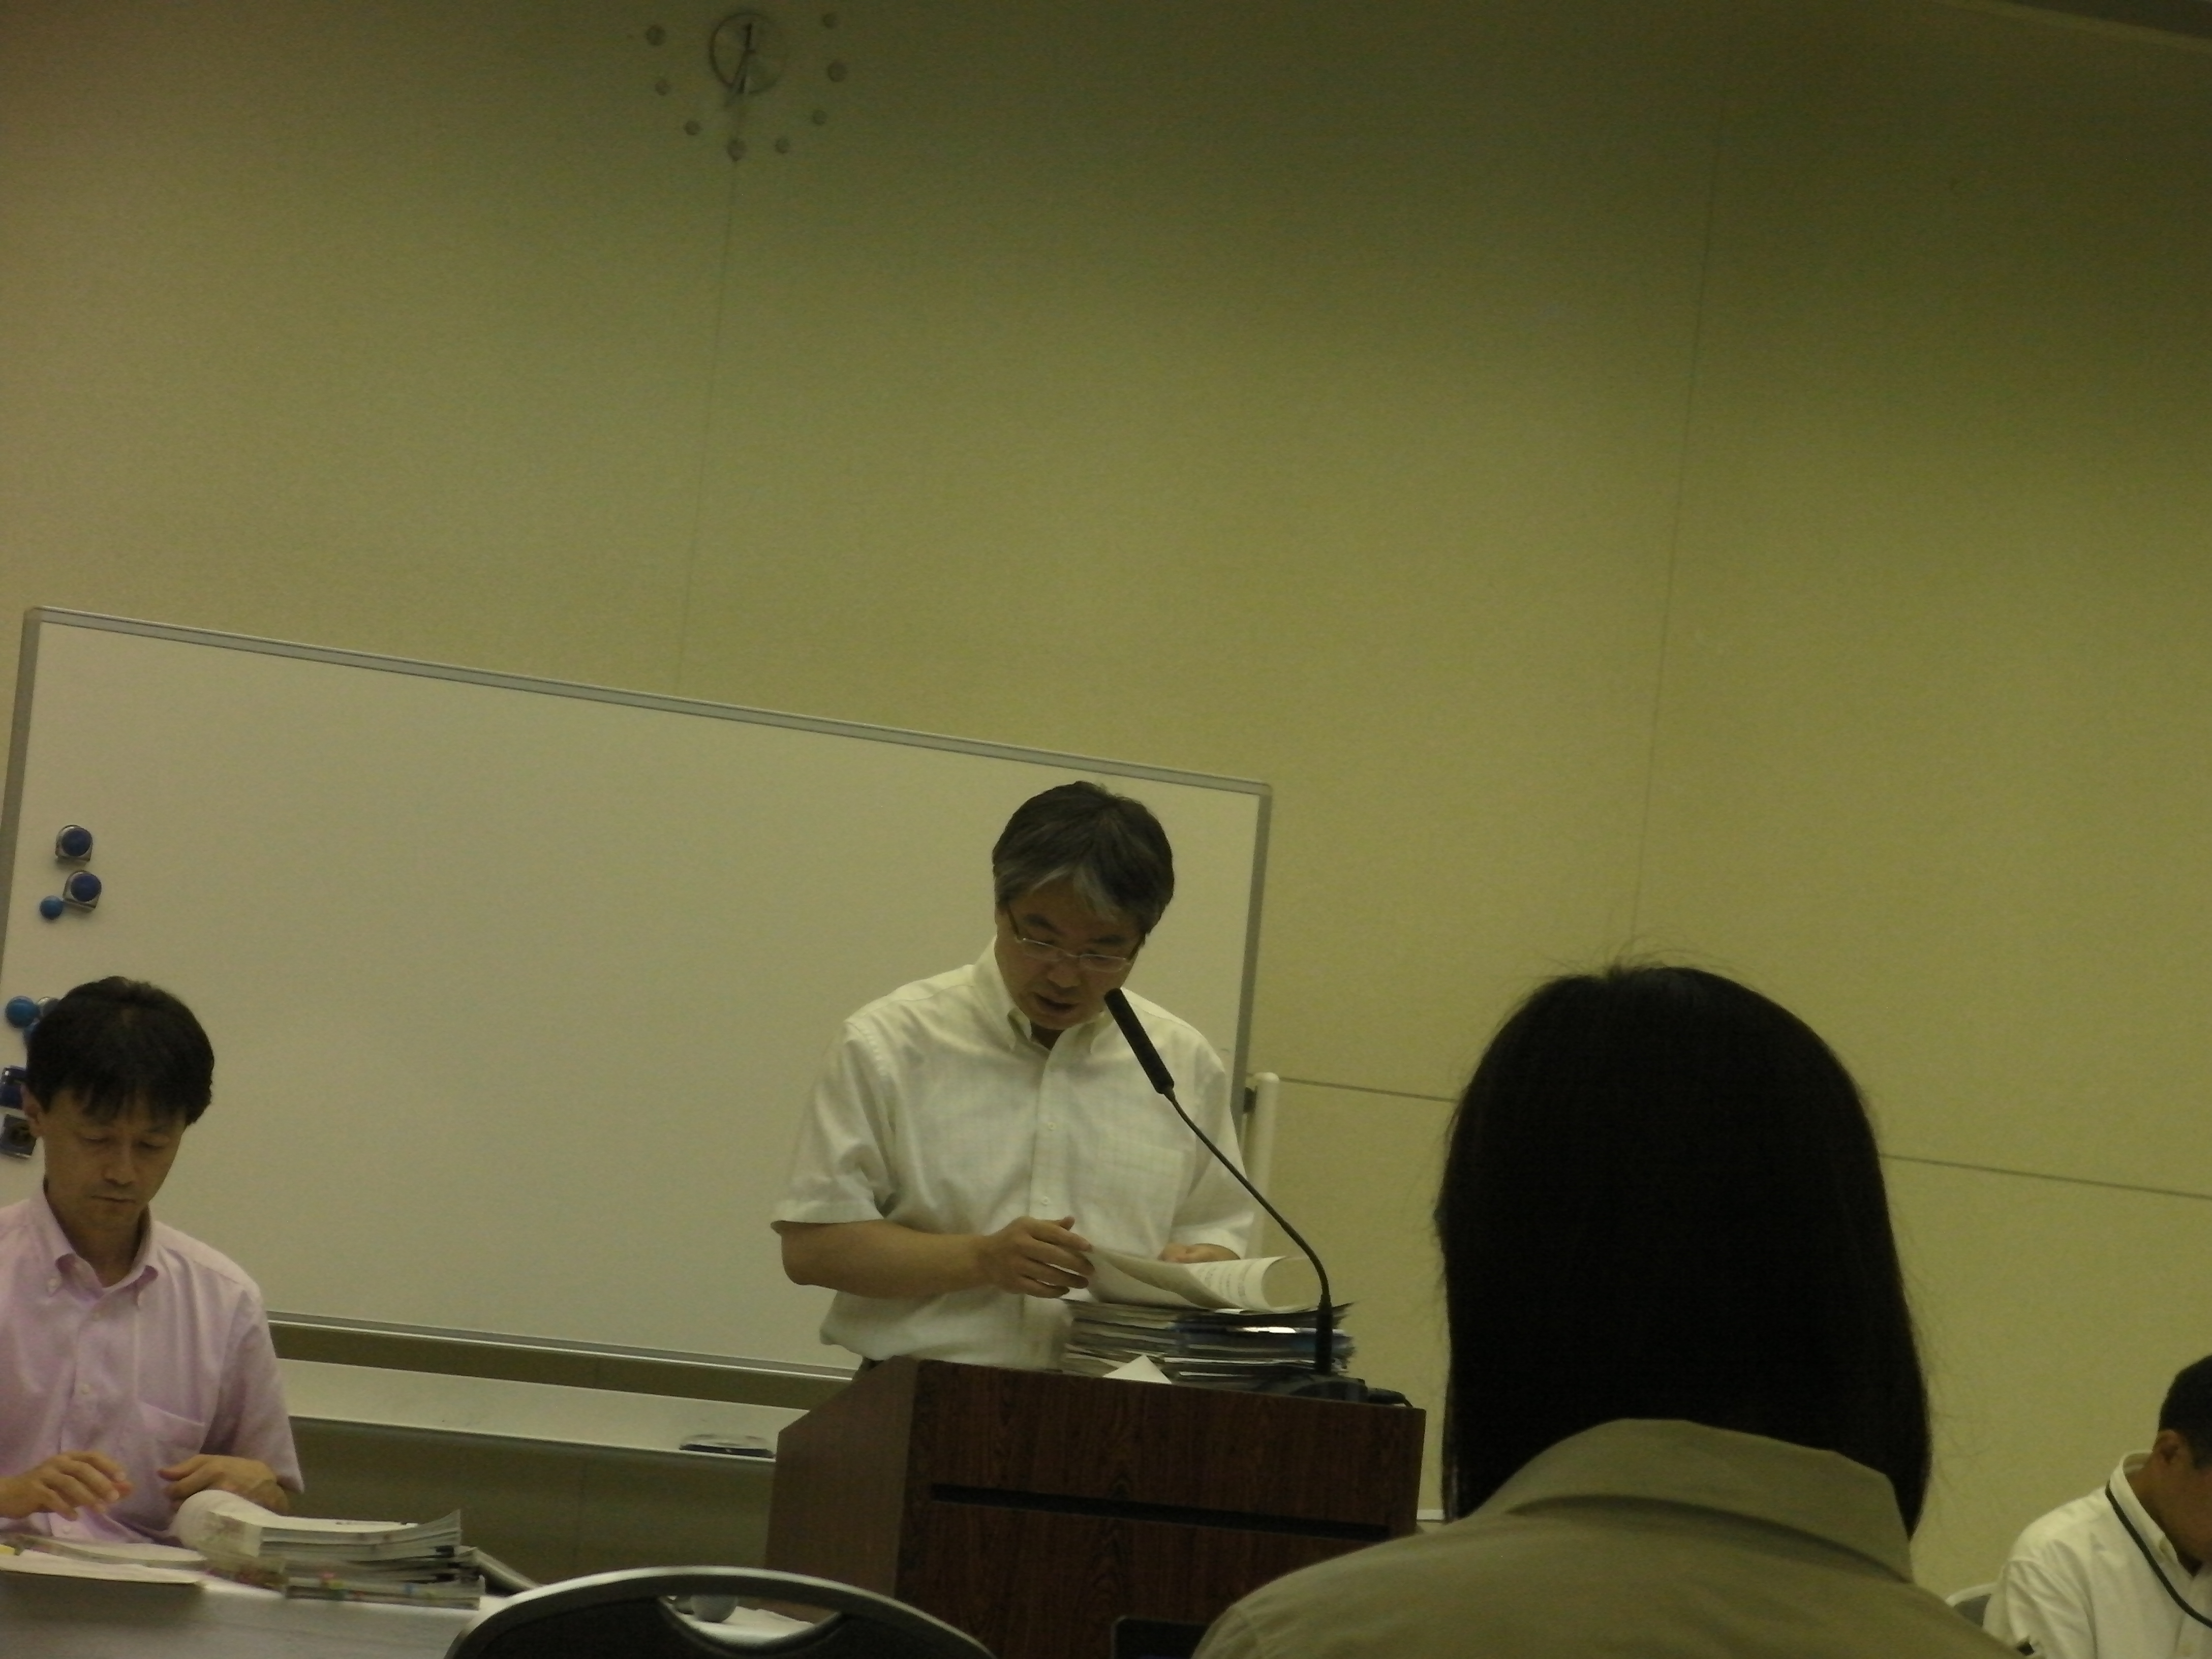 http://daily.magazine9.jp/m9/oshidori/SANY0323.JPG